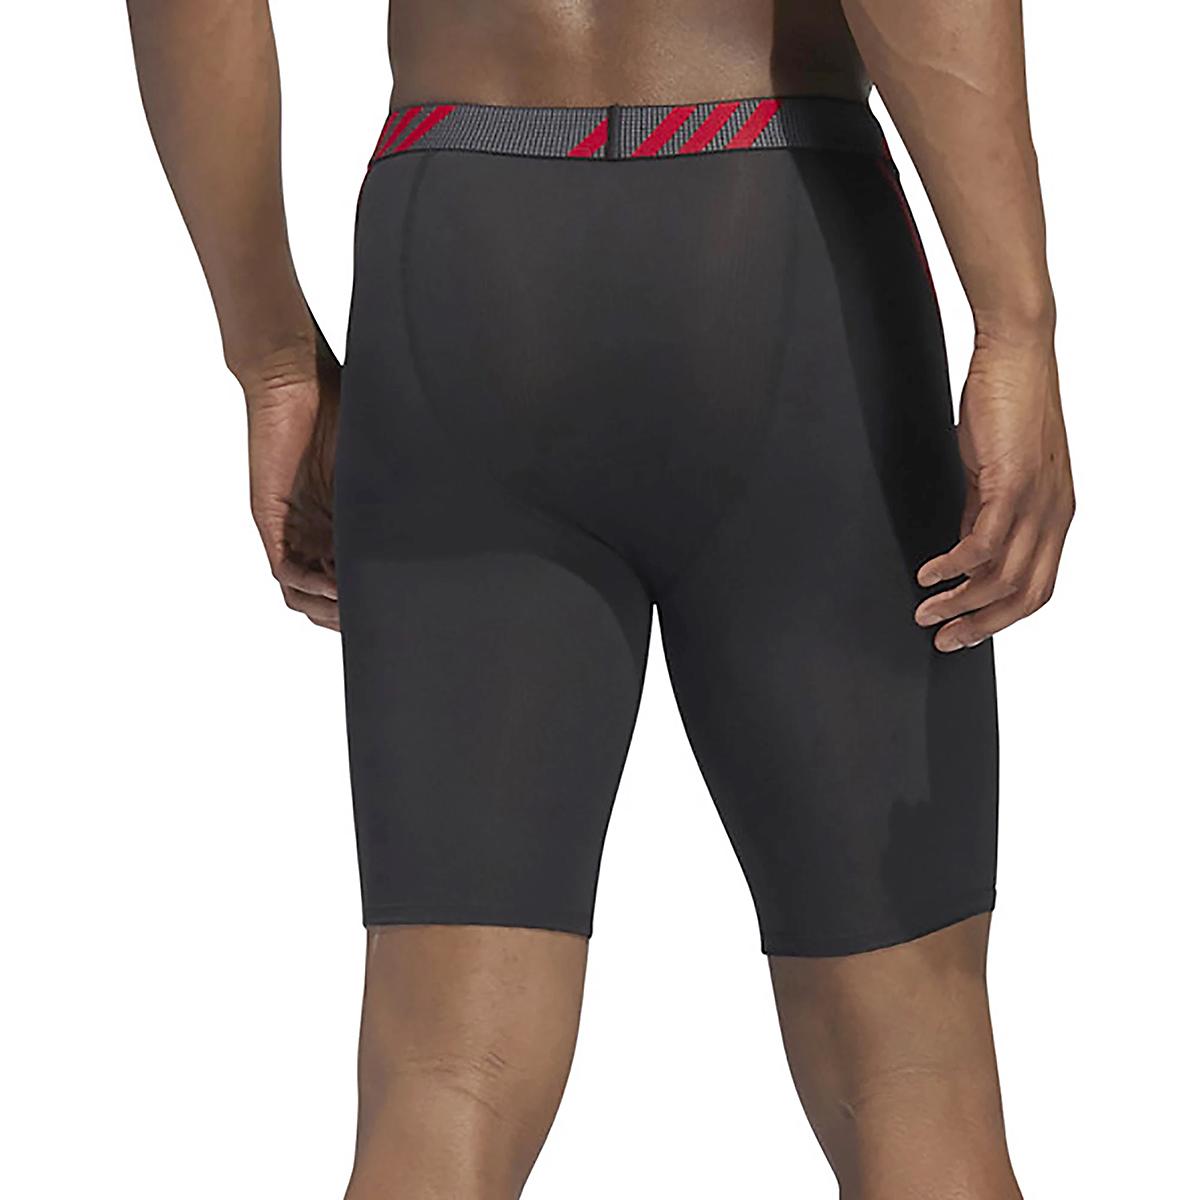 Men's Adidas Performance Mesh 3 Pack Boxer Briefs - Color: Black/Scarlet/Onix - Size: S, Black/Scarlet/Onix, large, image 4